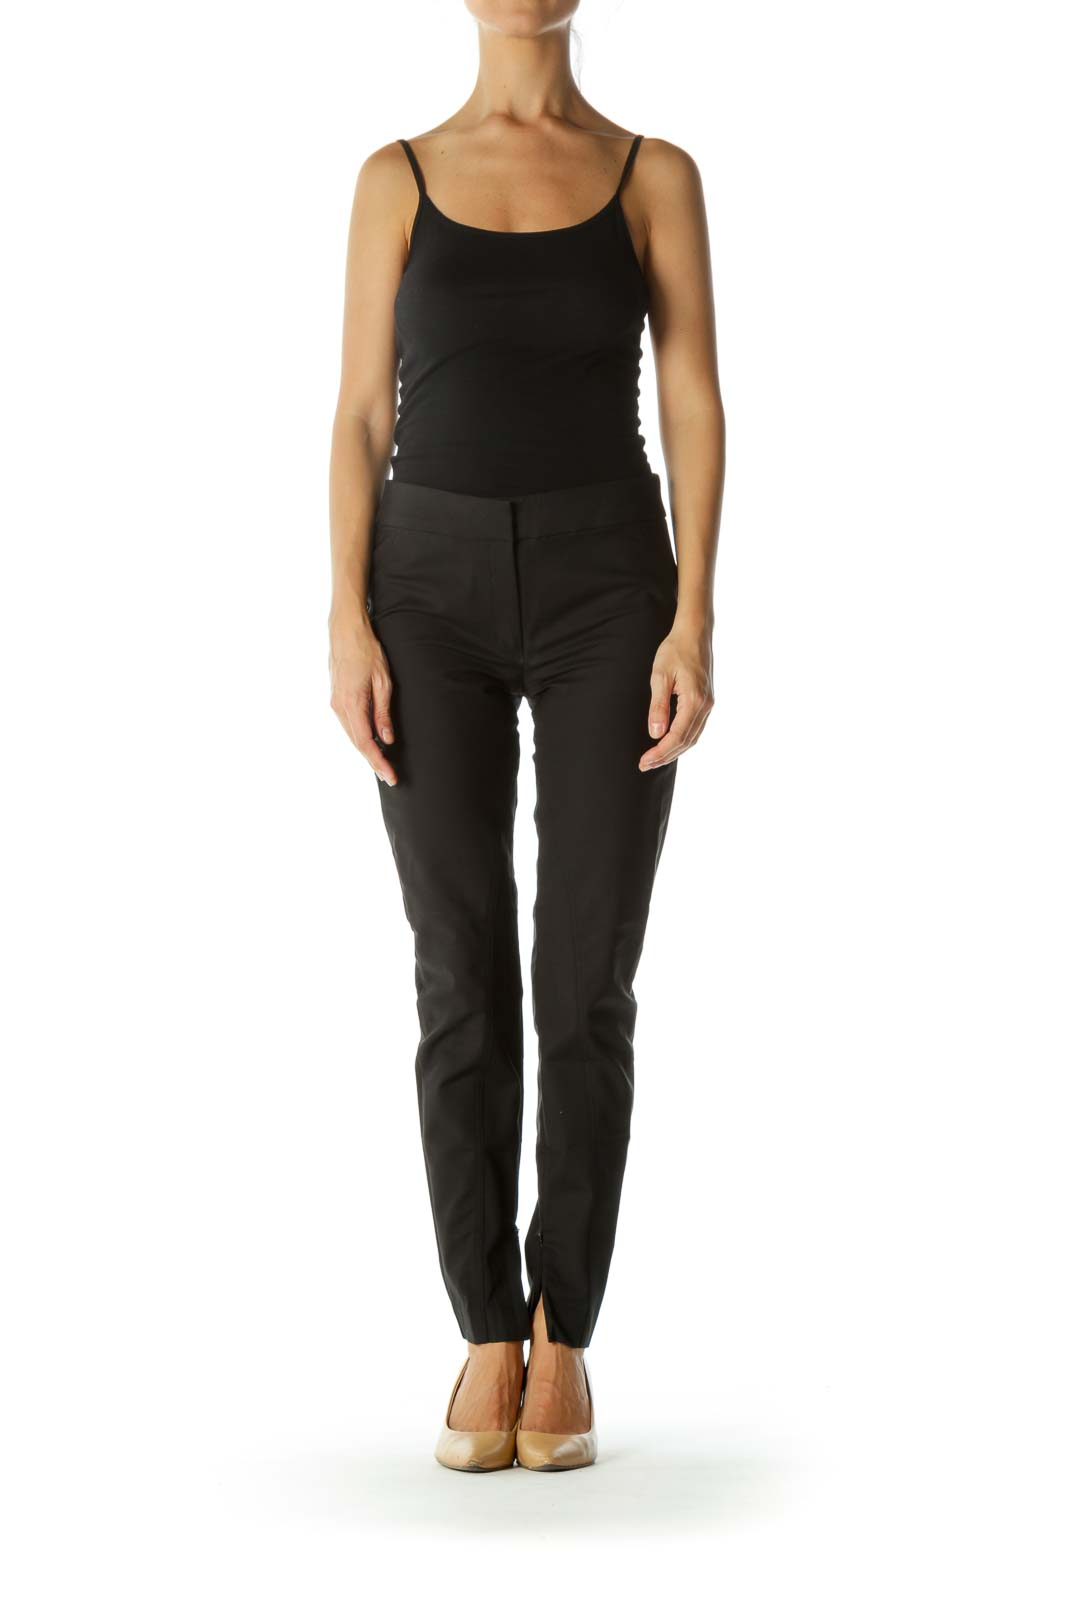 Black Cotton Blend Scuba Style Zippered Ankles Detail Pants